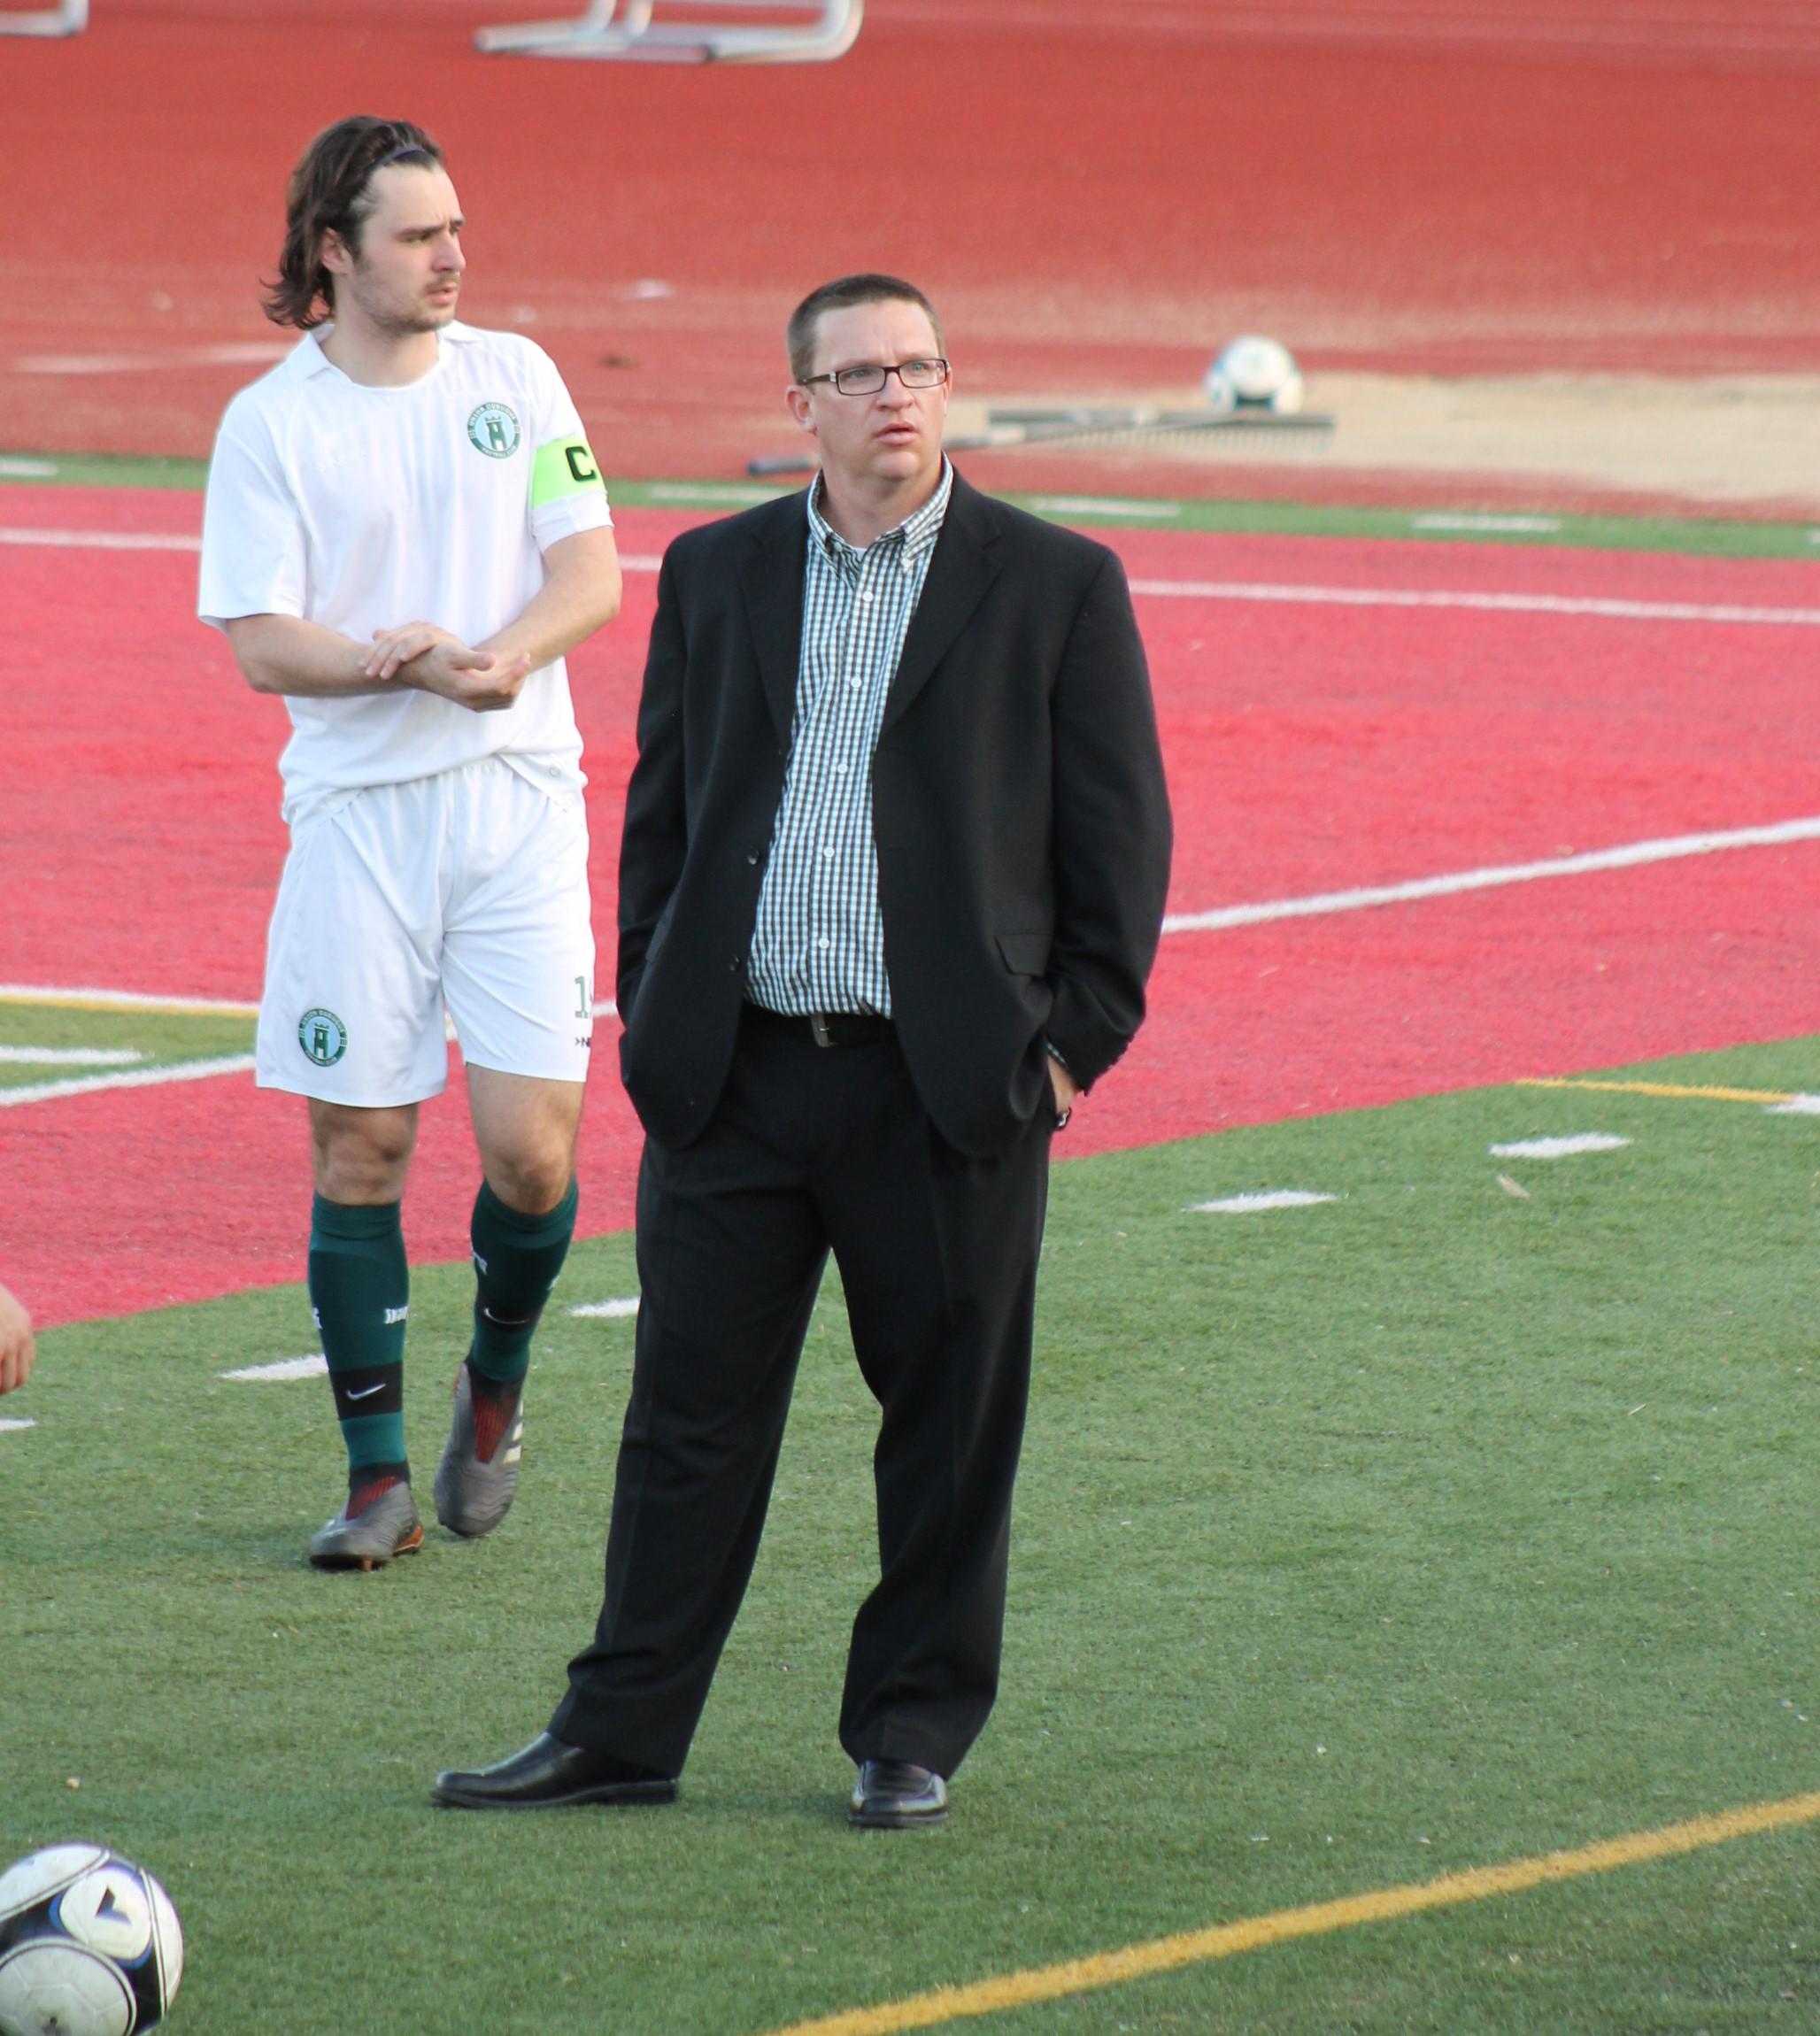 First-team manager Jon Denham and captain Ryan Pacholski